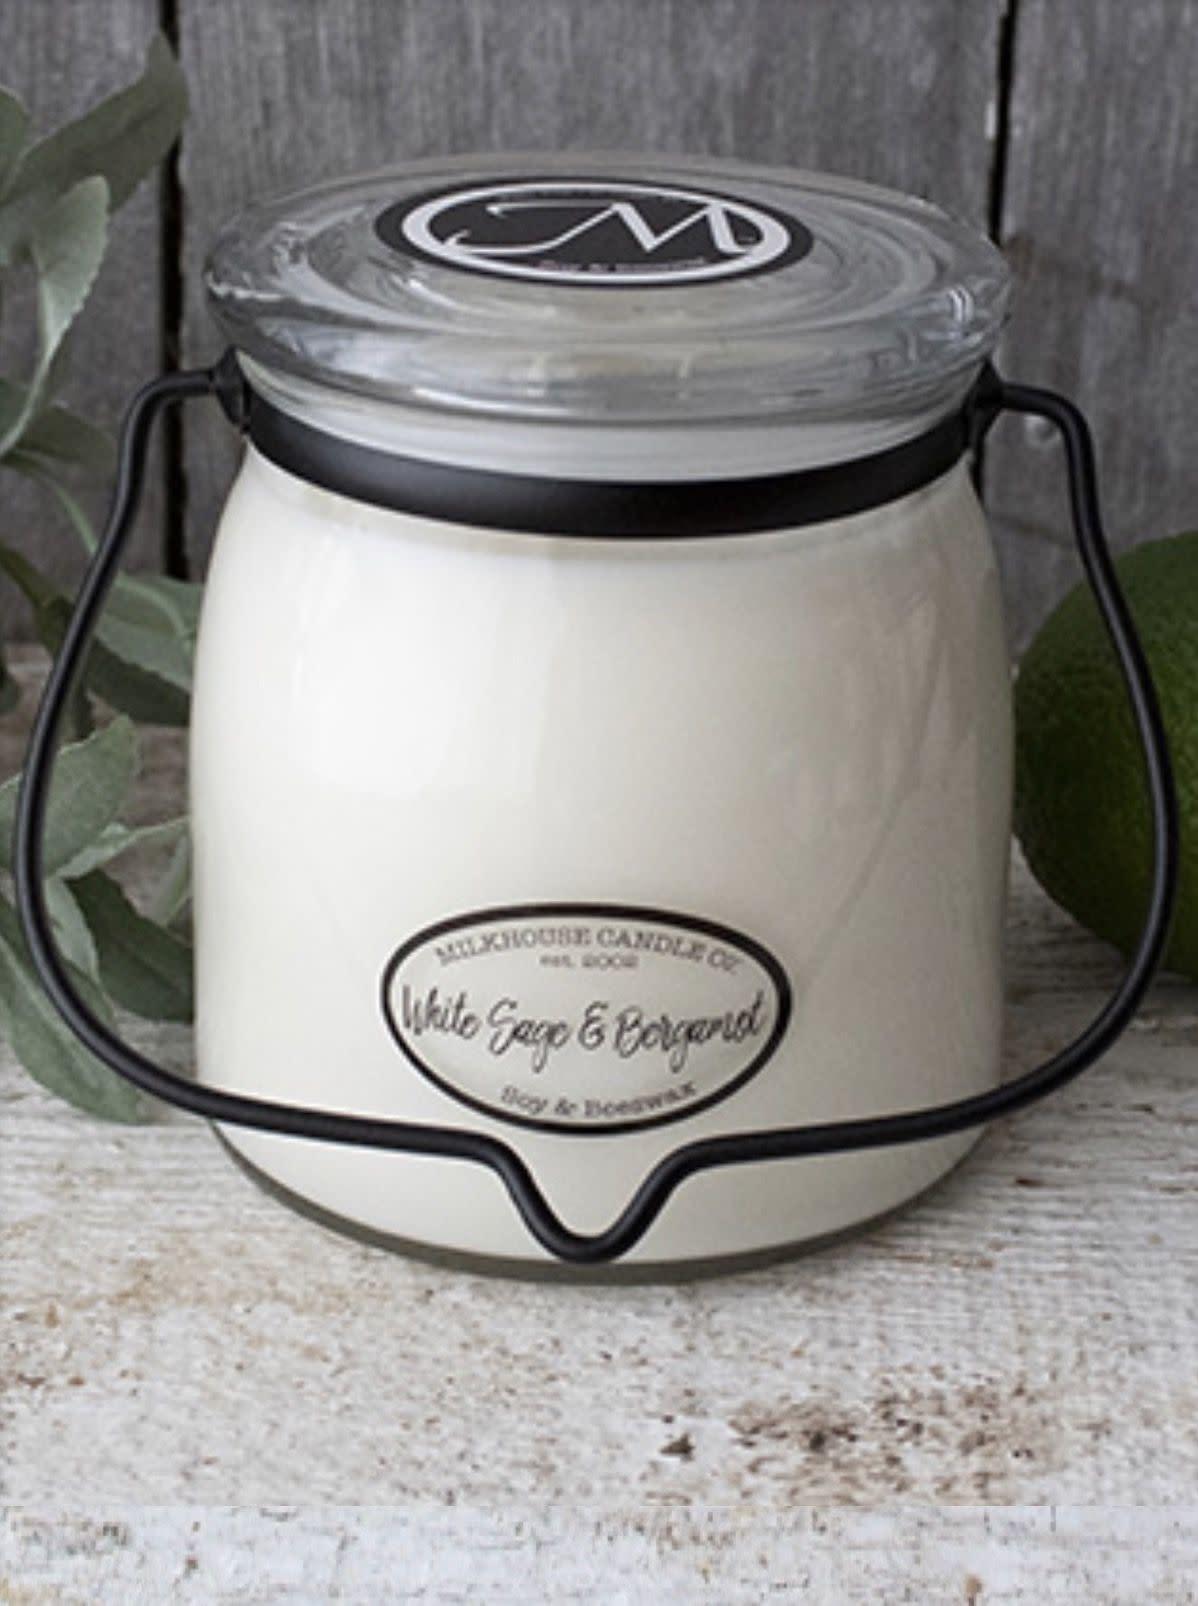 Milkhouse Candles Milkhouse Candle White Sage & Bergamot16oz Butter Jar